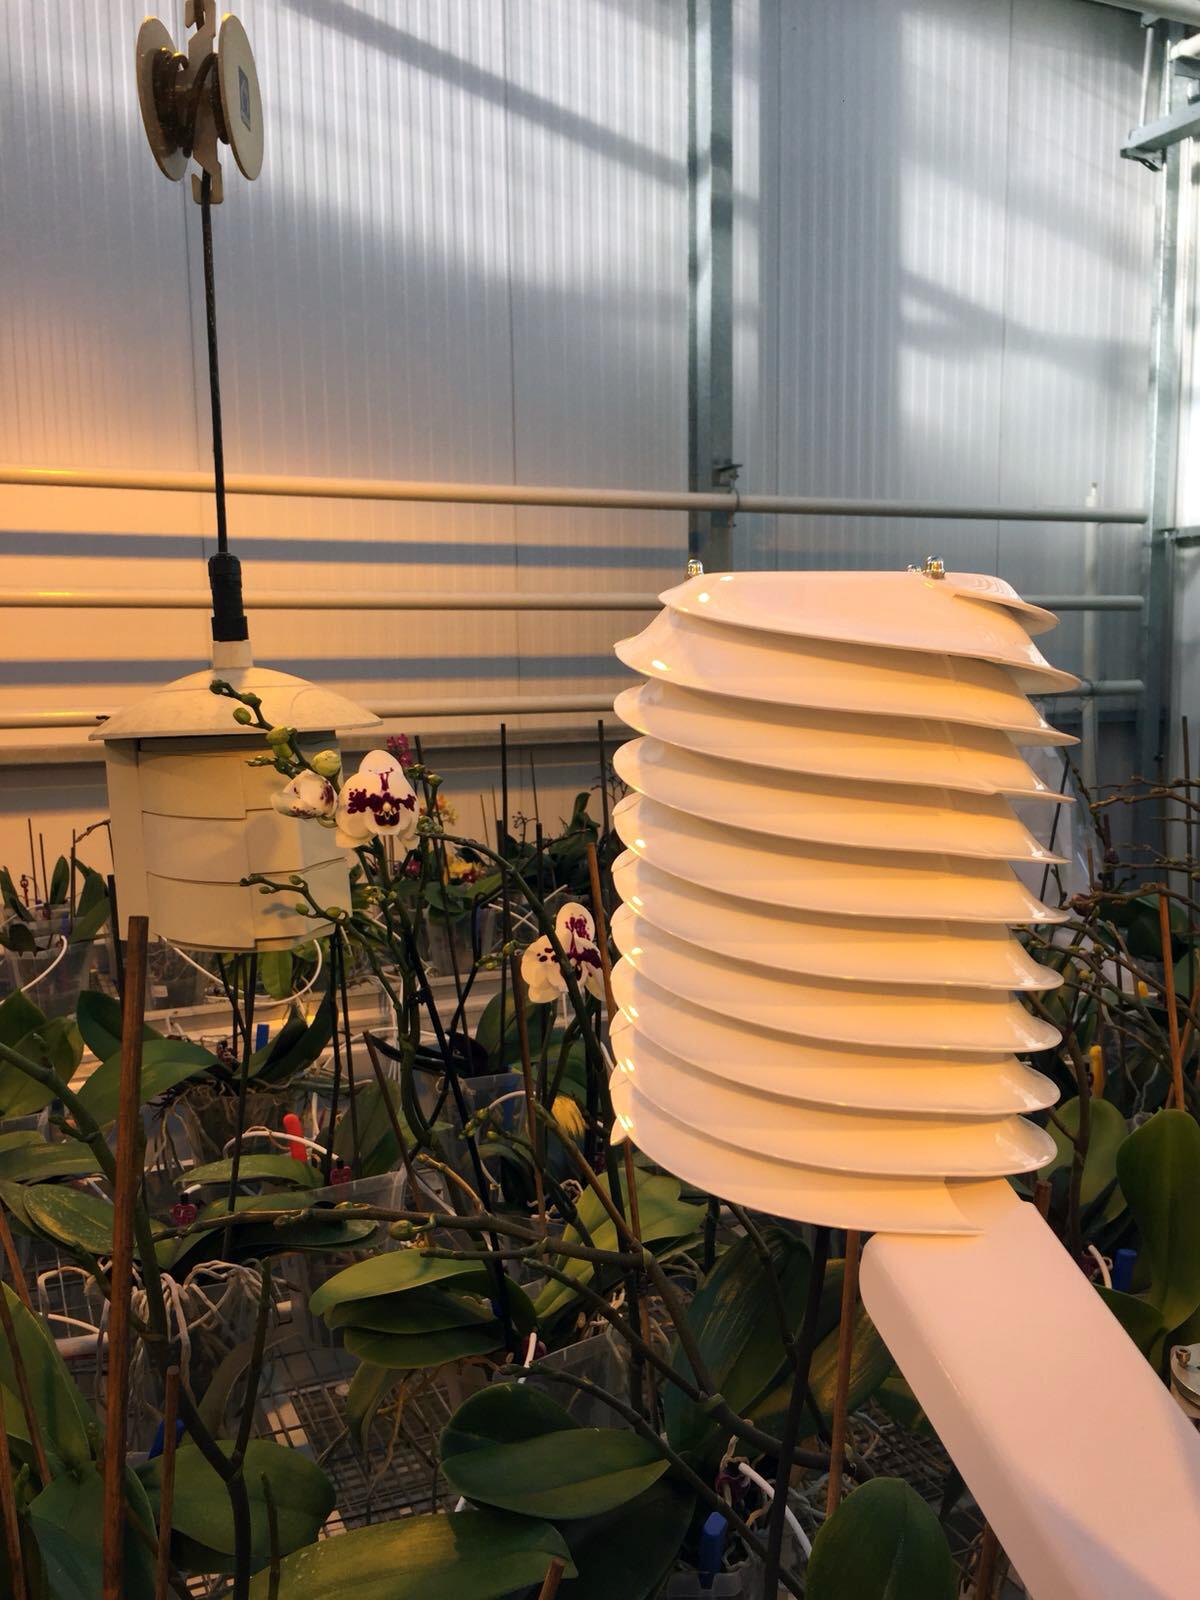 MeteoShield Professional solar radiation shield in Greenhouse